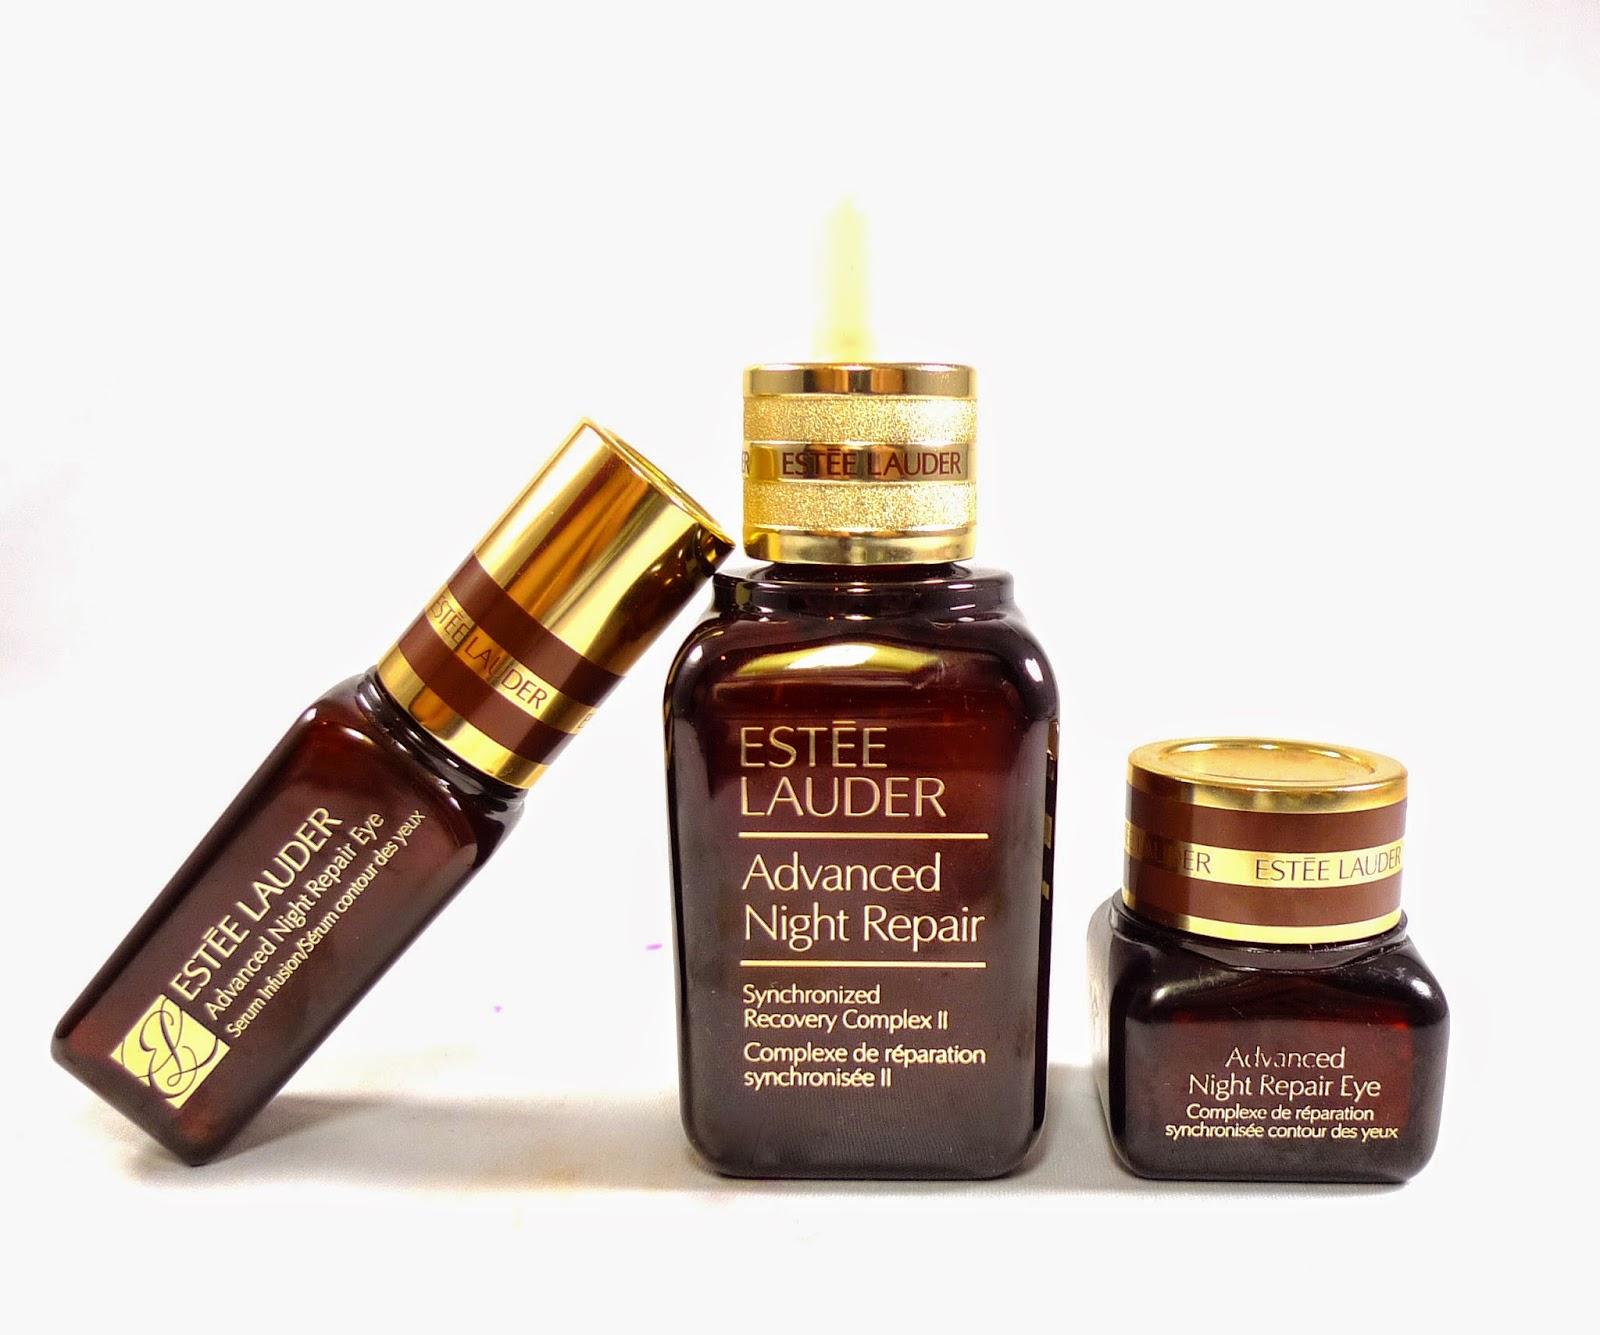 est e lauder advanced night repair serum 2 review the. Black Bedroom Furniture Sets. Home Design Ideas